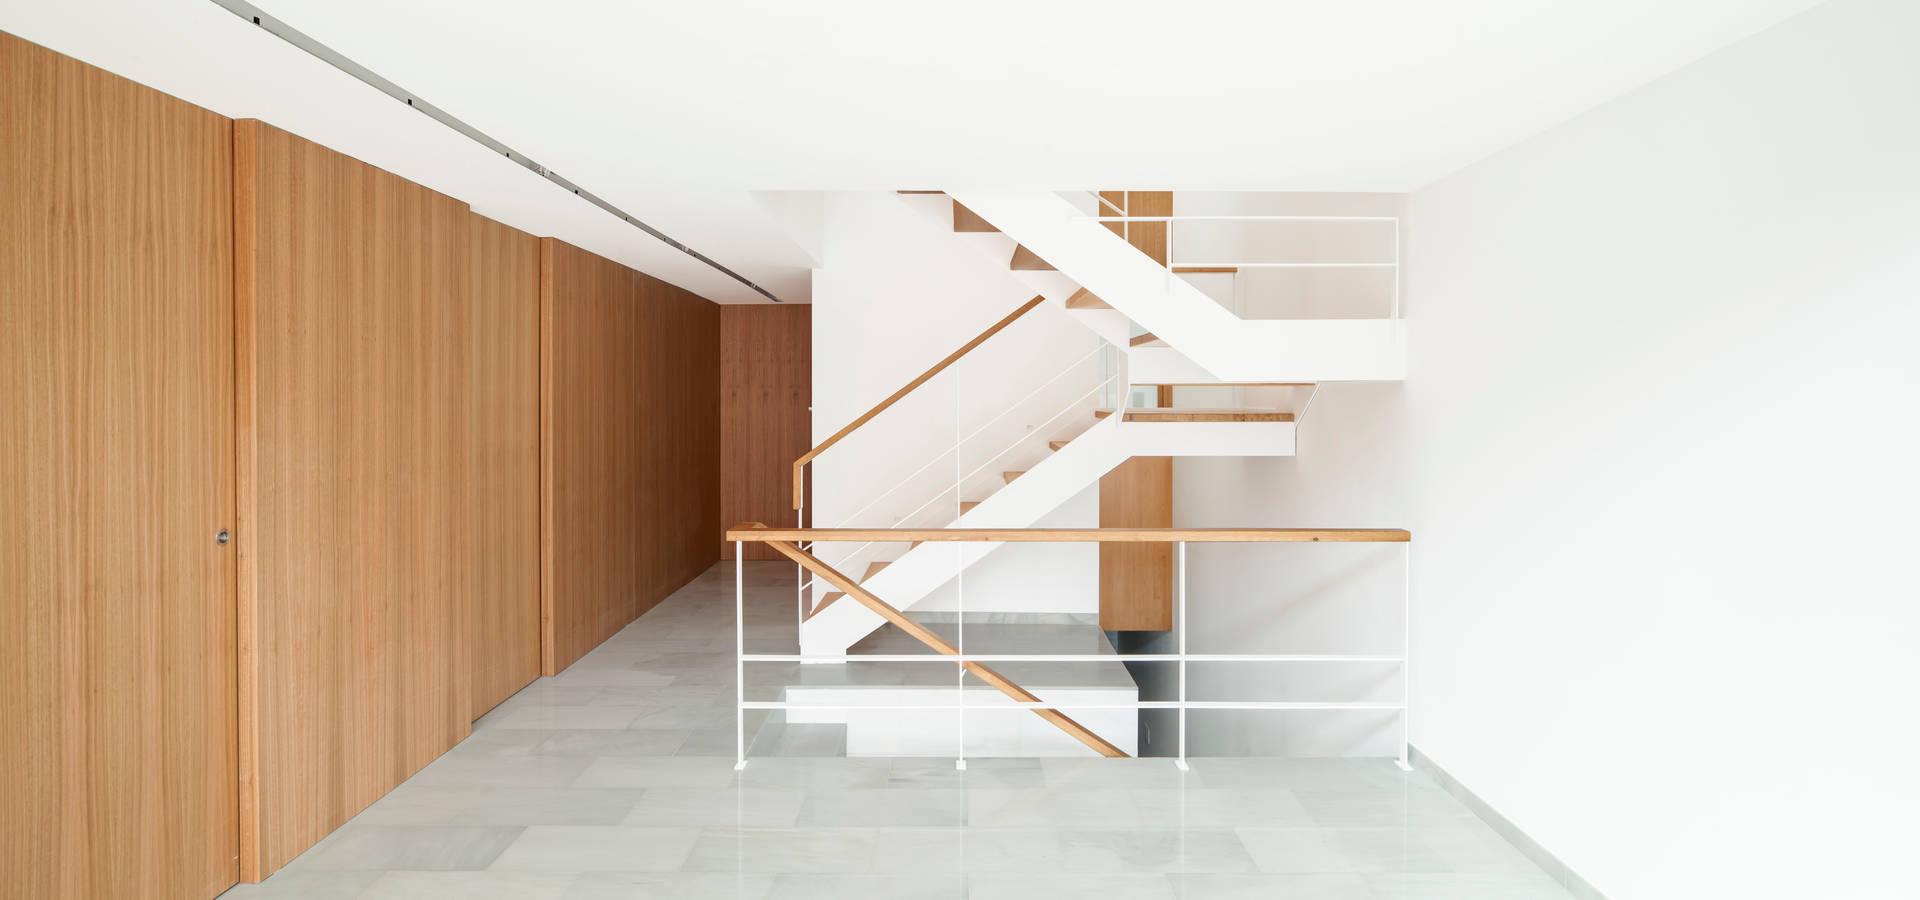 Alventosa Morell Arquitectes